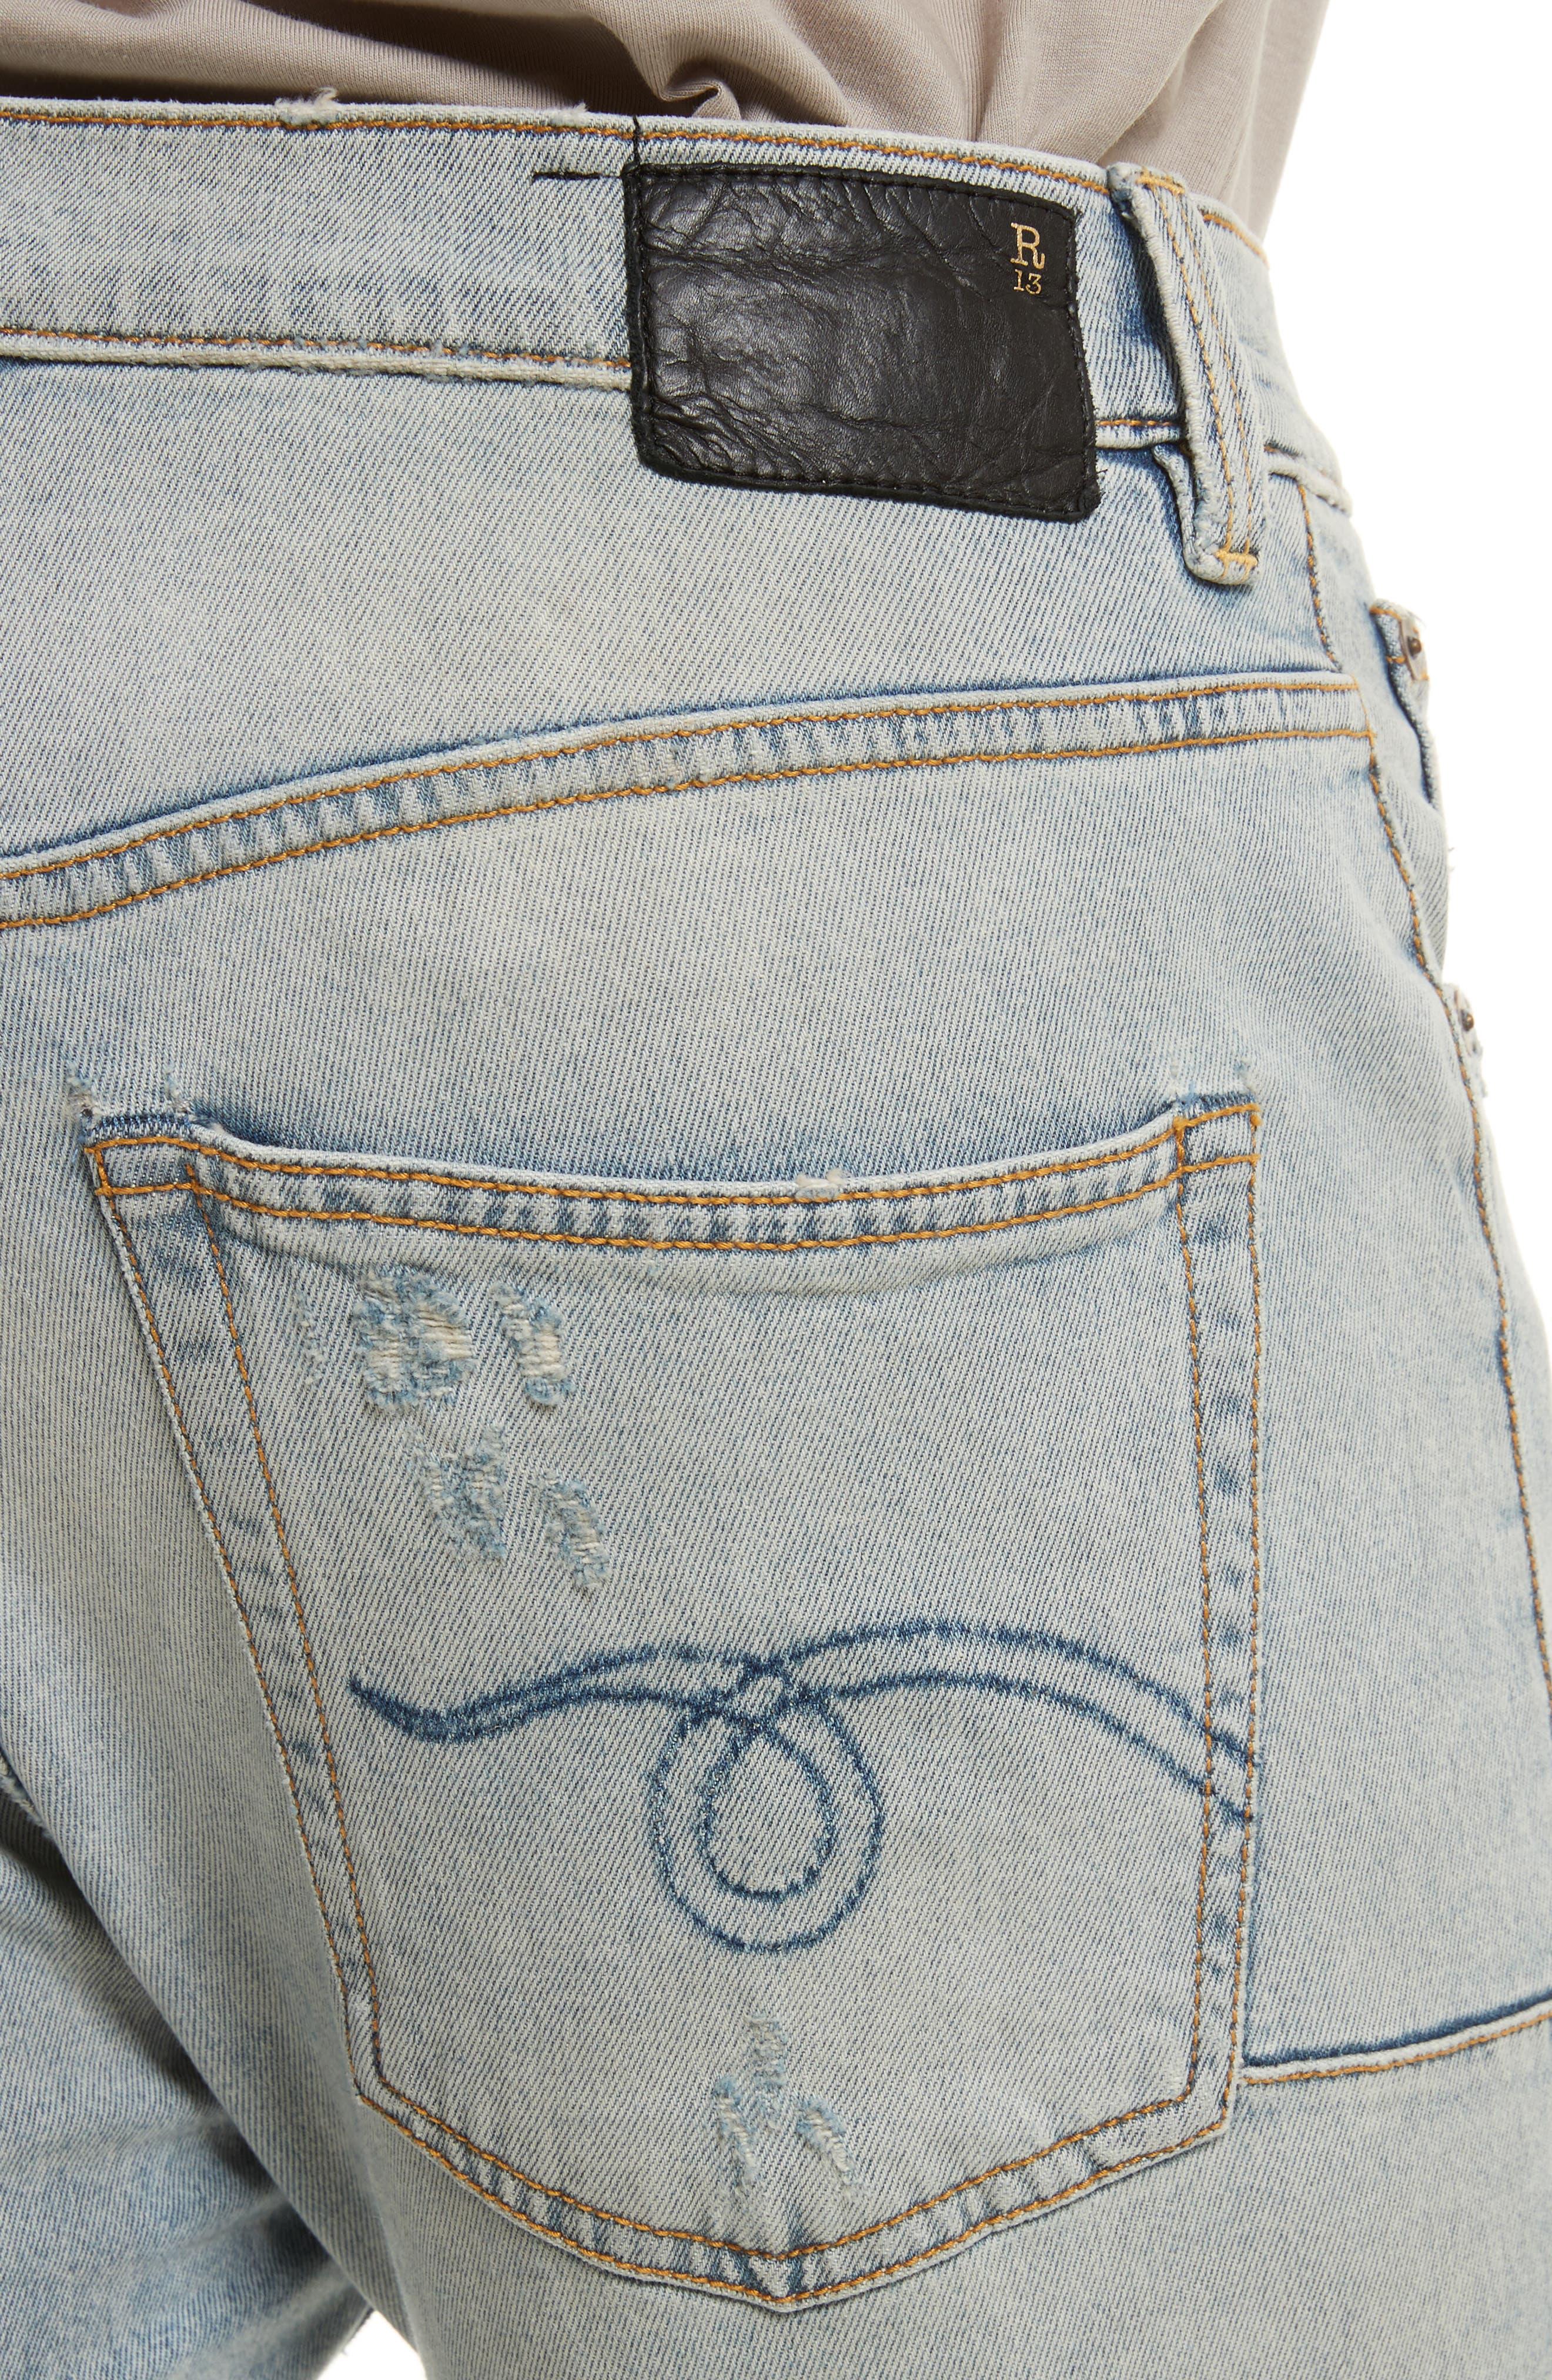 Skate Destroyed Jeans,                             Alternate thumbnail 4, color,                             460